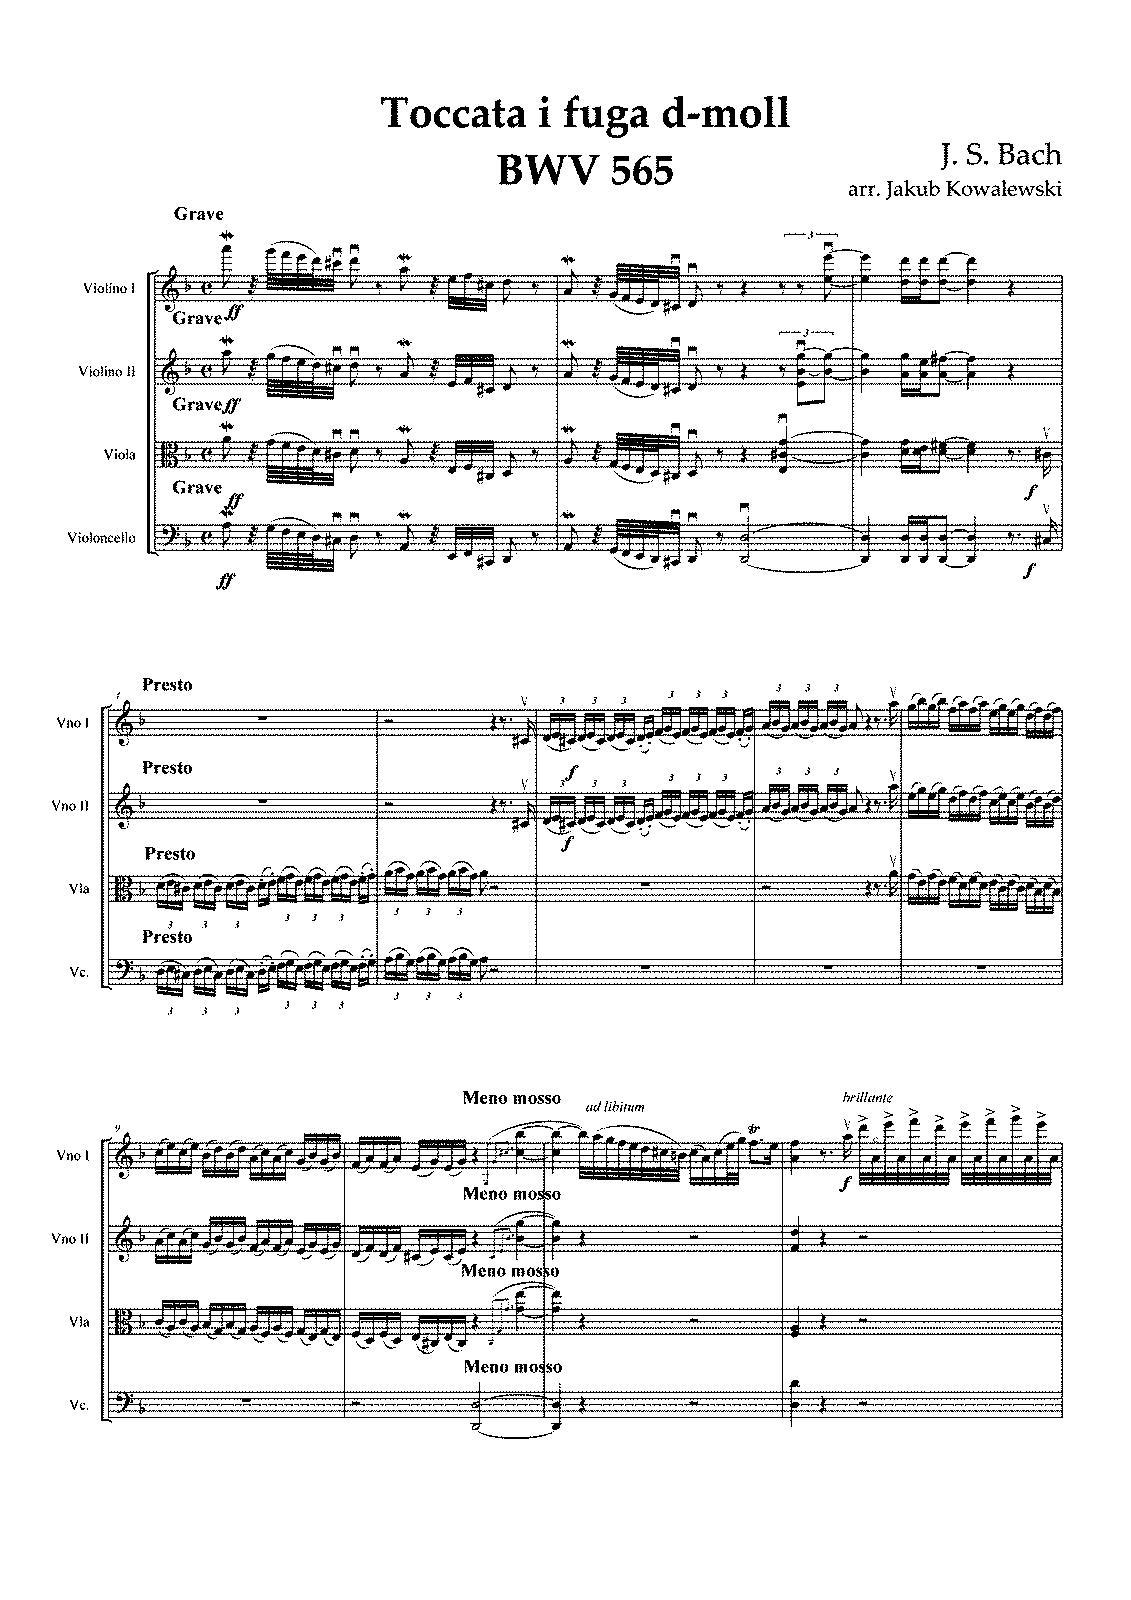 bach toccata and fugue in d minor pdf